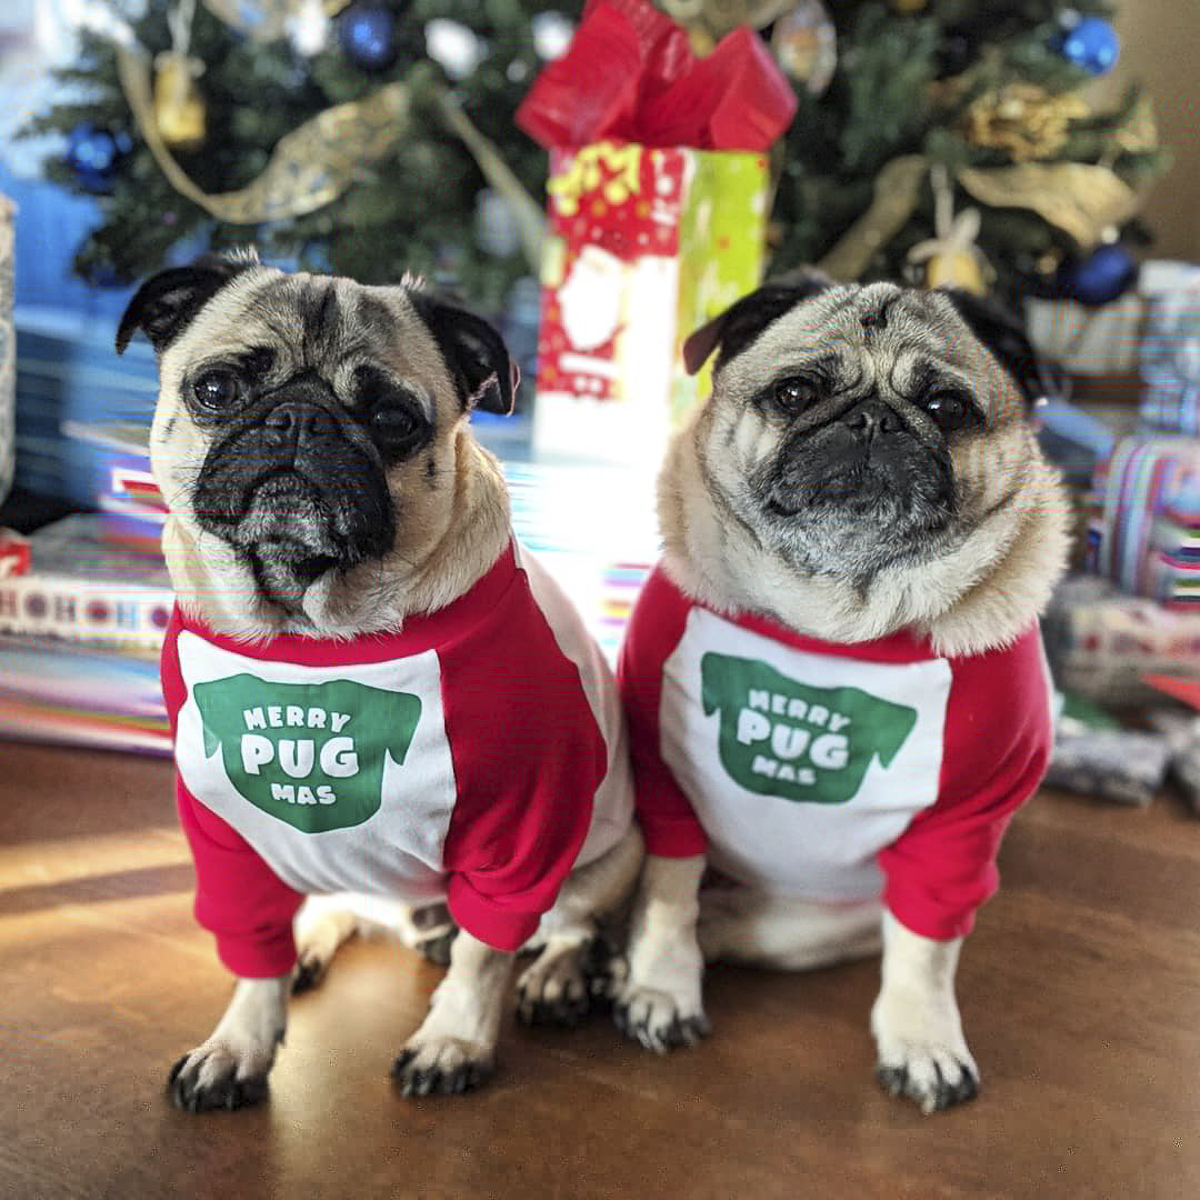 Dexter + Walter's Social Pug Profile | www.thepugdiary.com